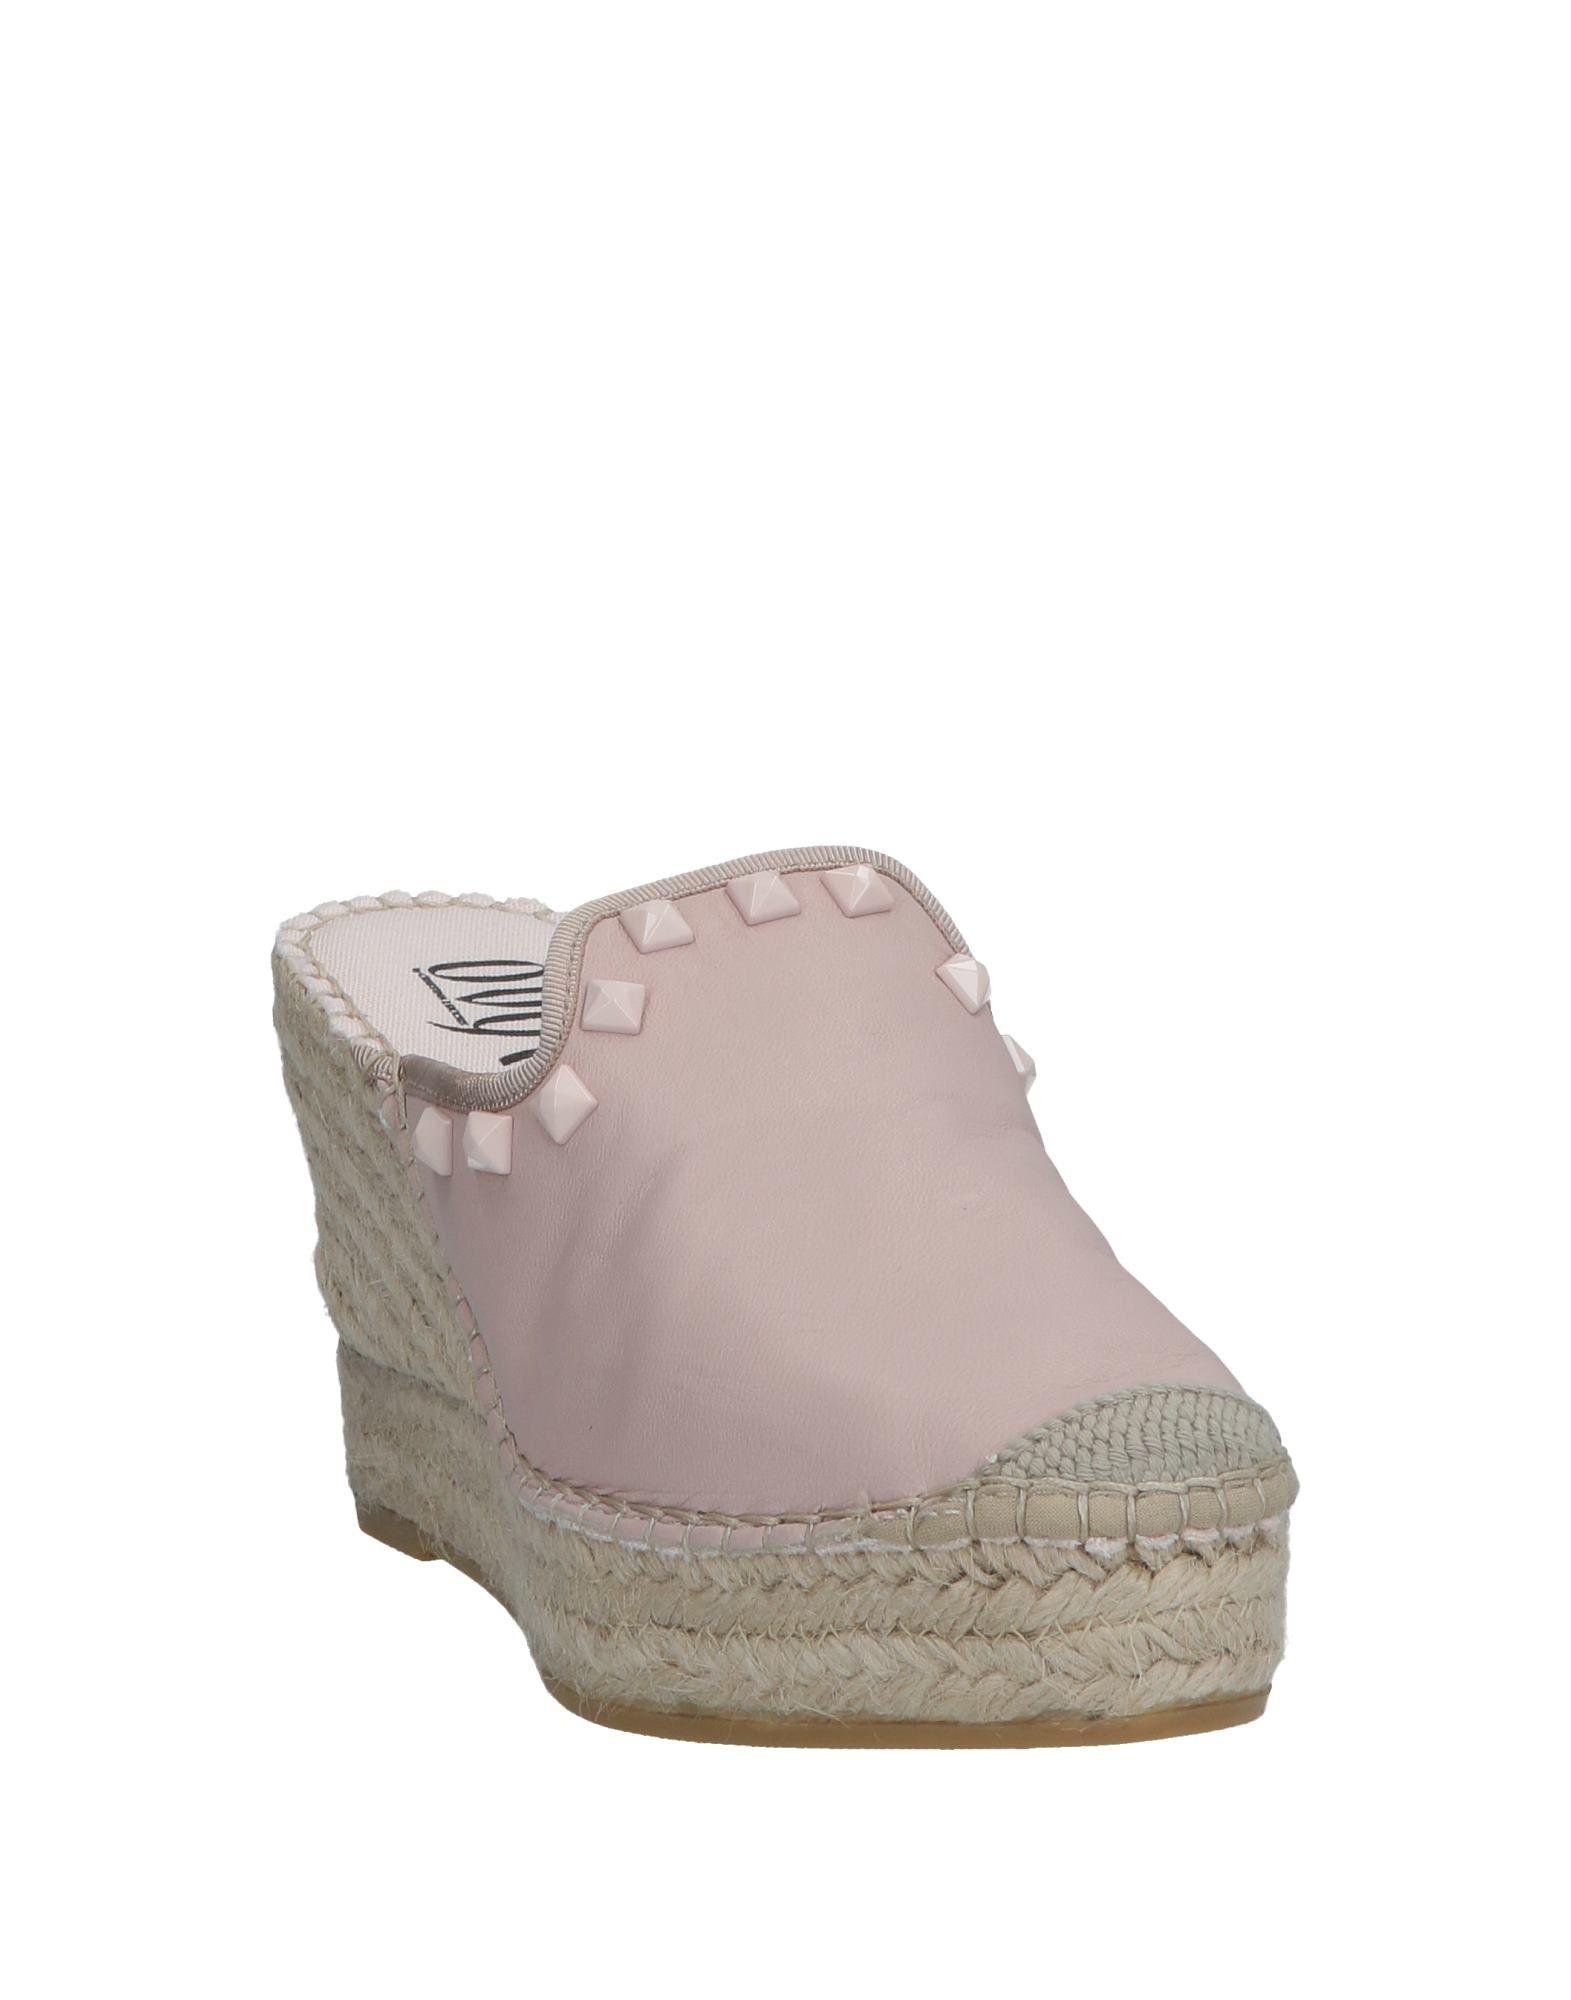 Ovye' By Cristina Qualität Lucchi Pantoletten Damen  11563842FI Gute Qualität Cristina beliebte Schuhe 0f0eb2